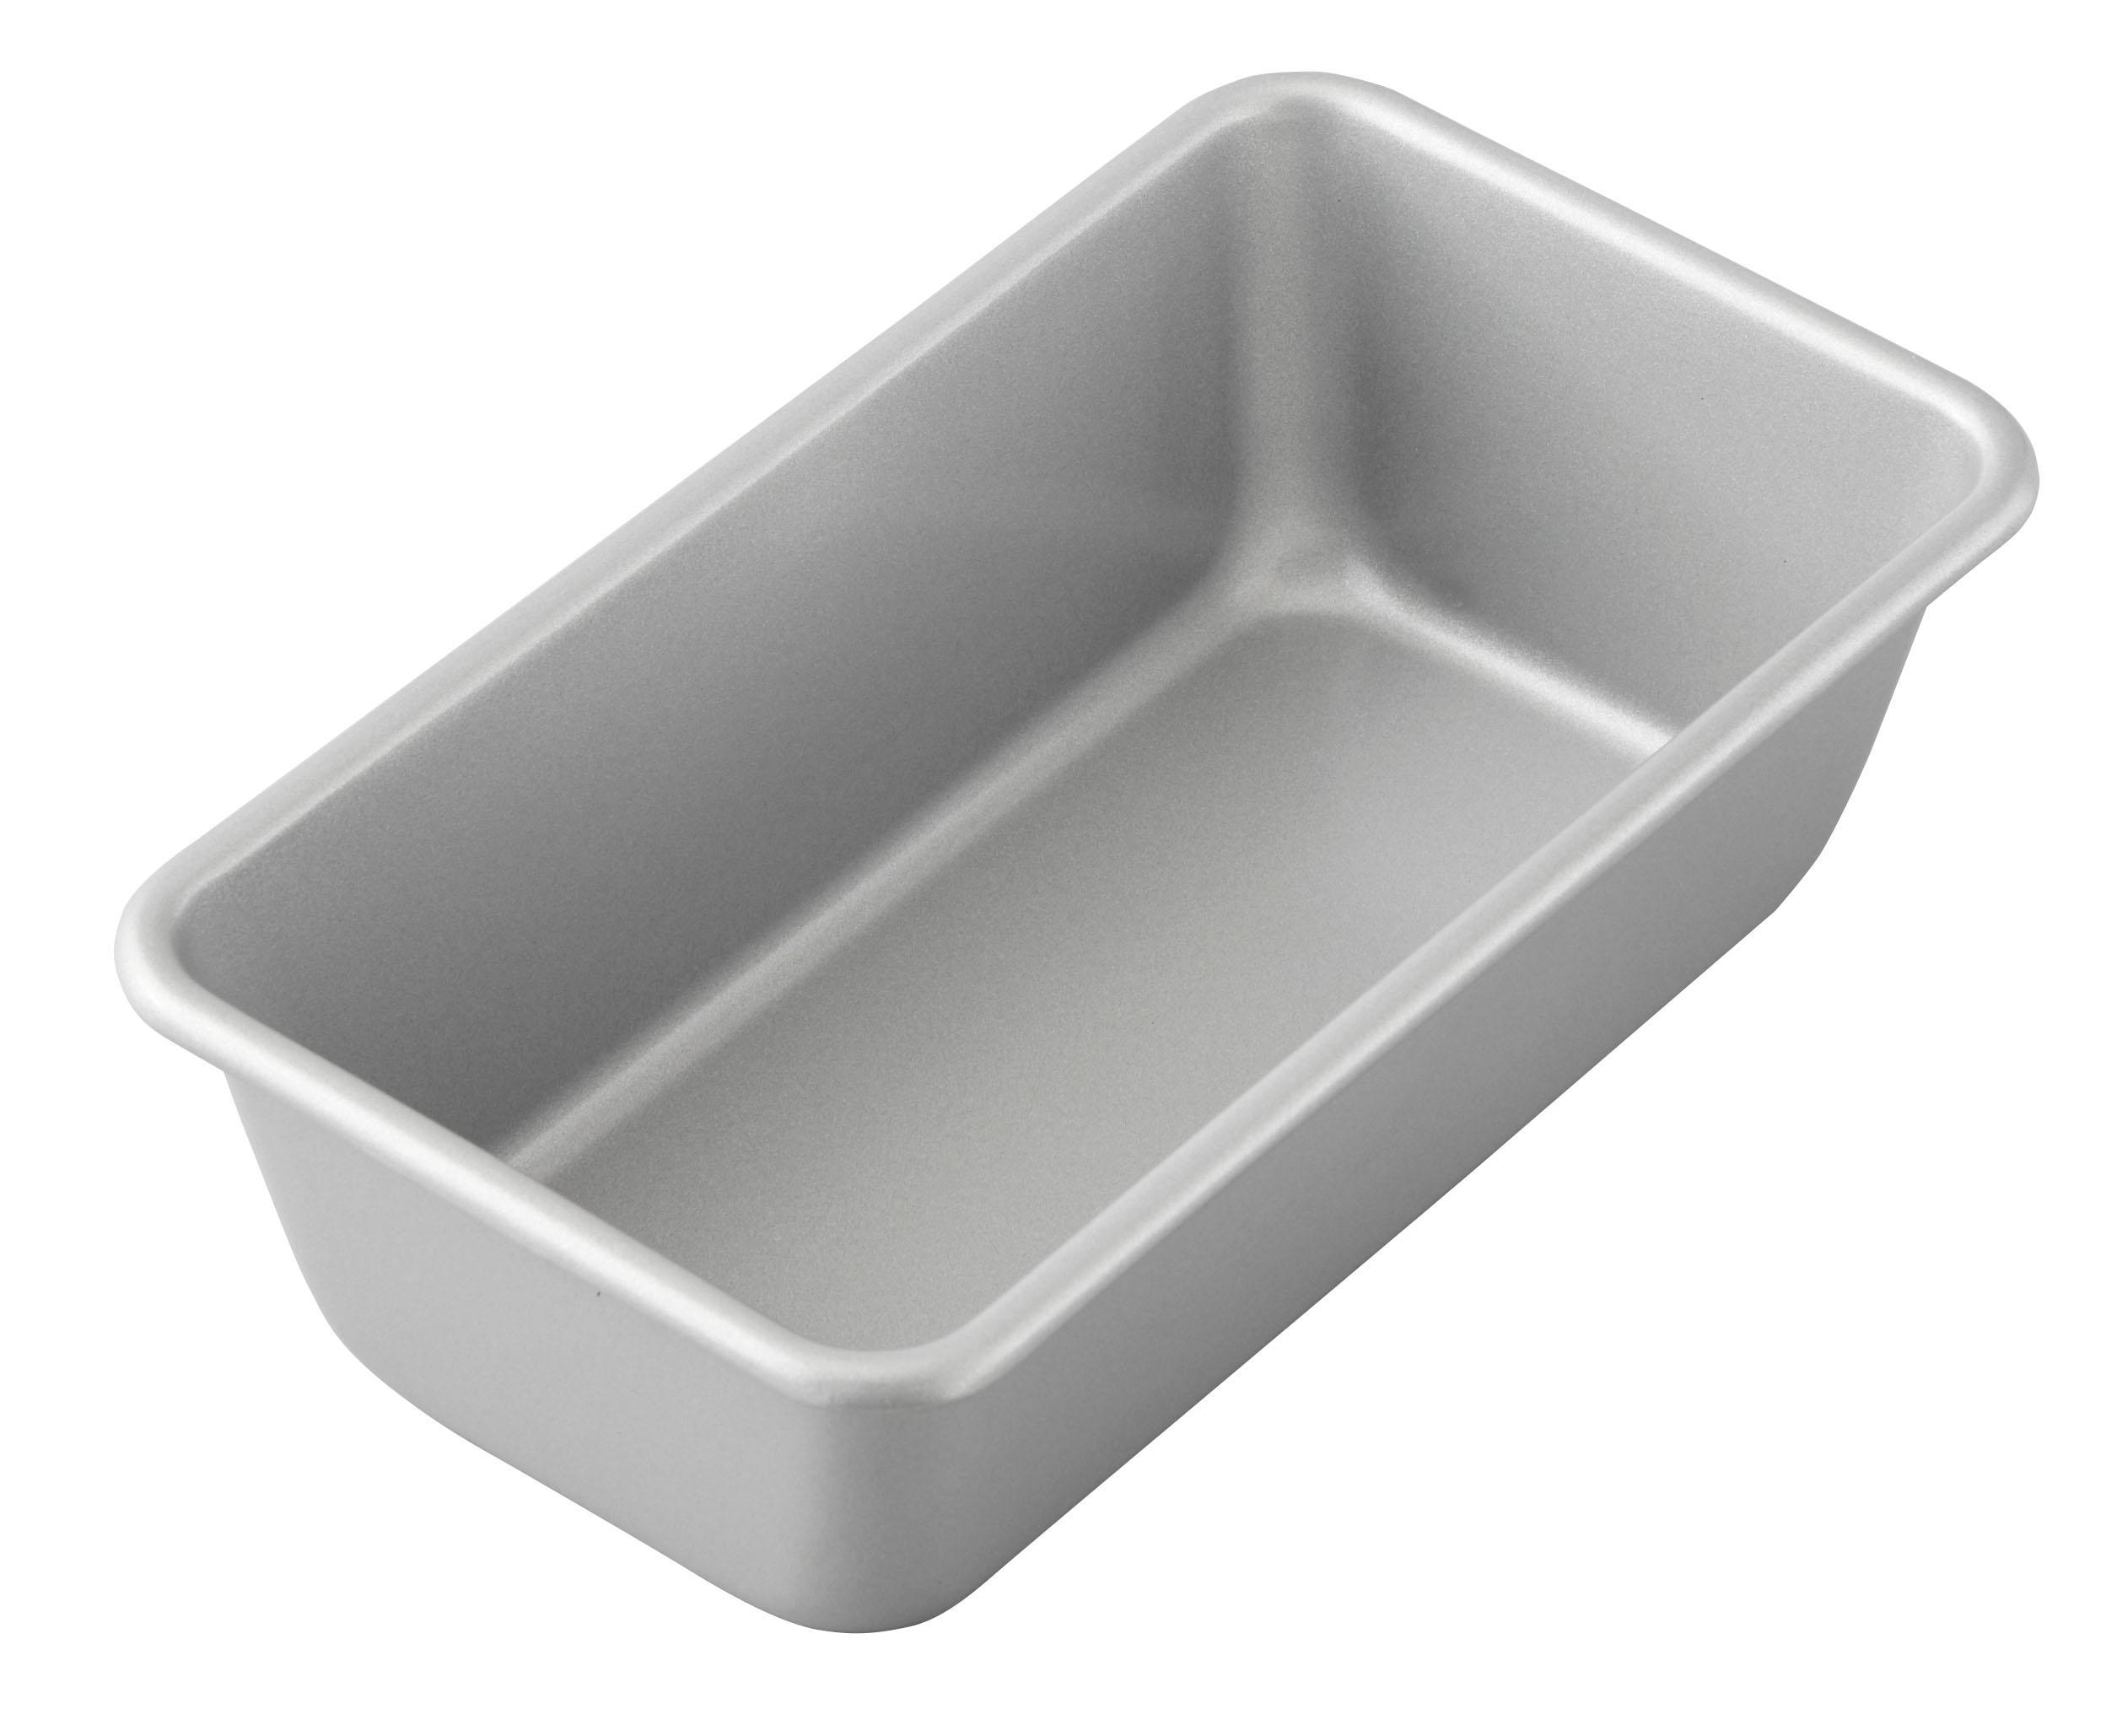 The Sweet Home Best Nonstick Pan